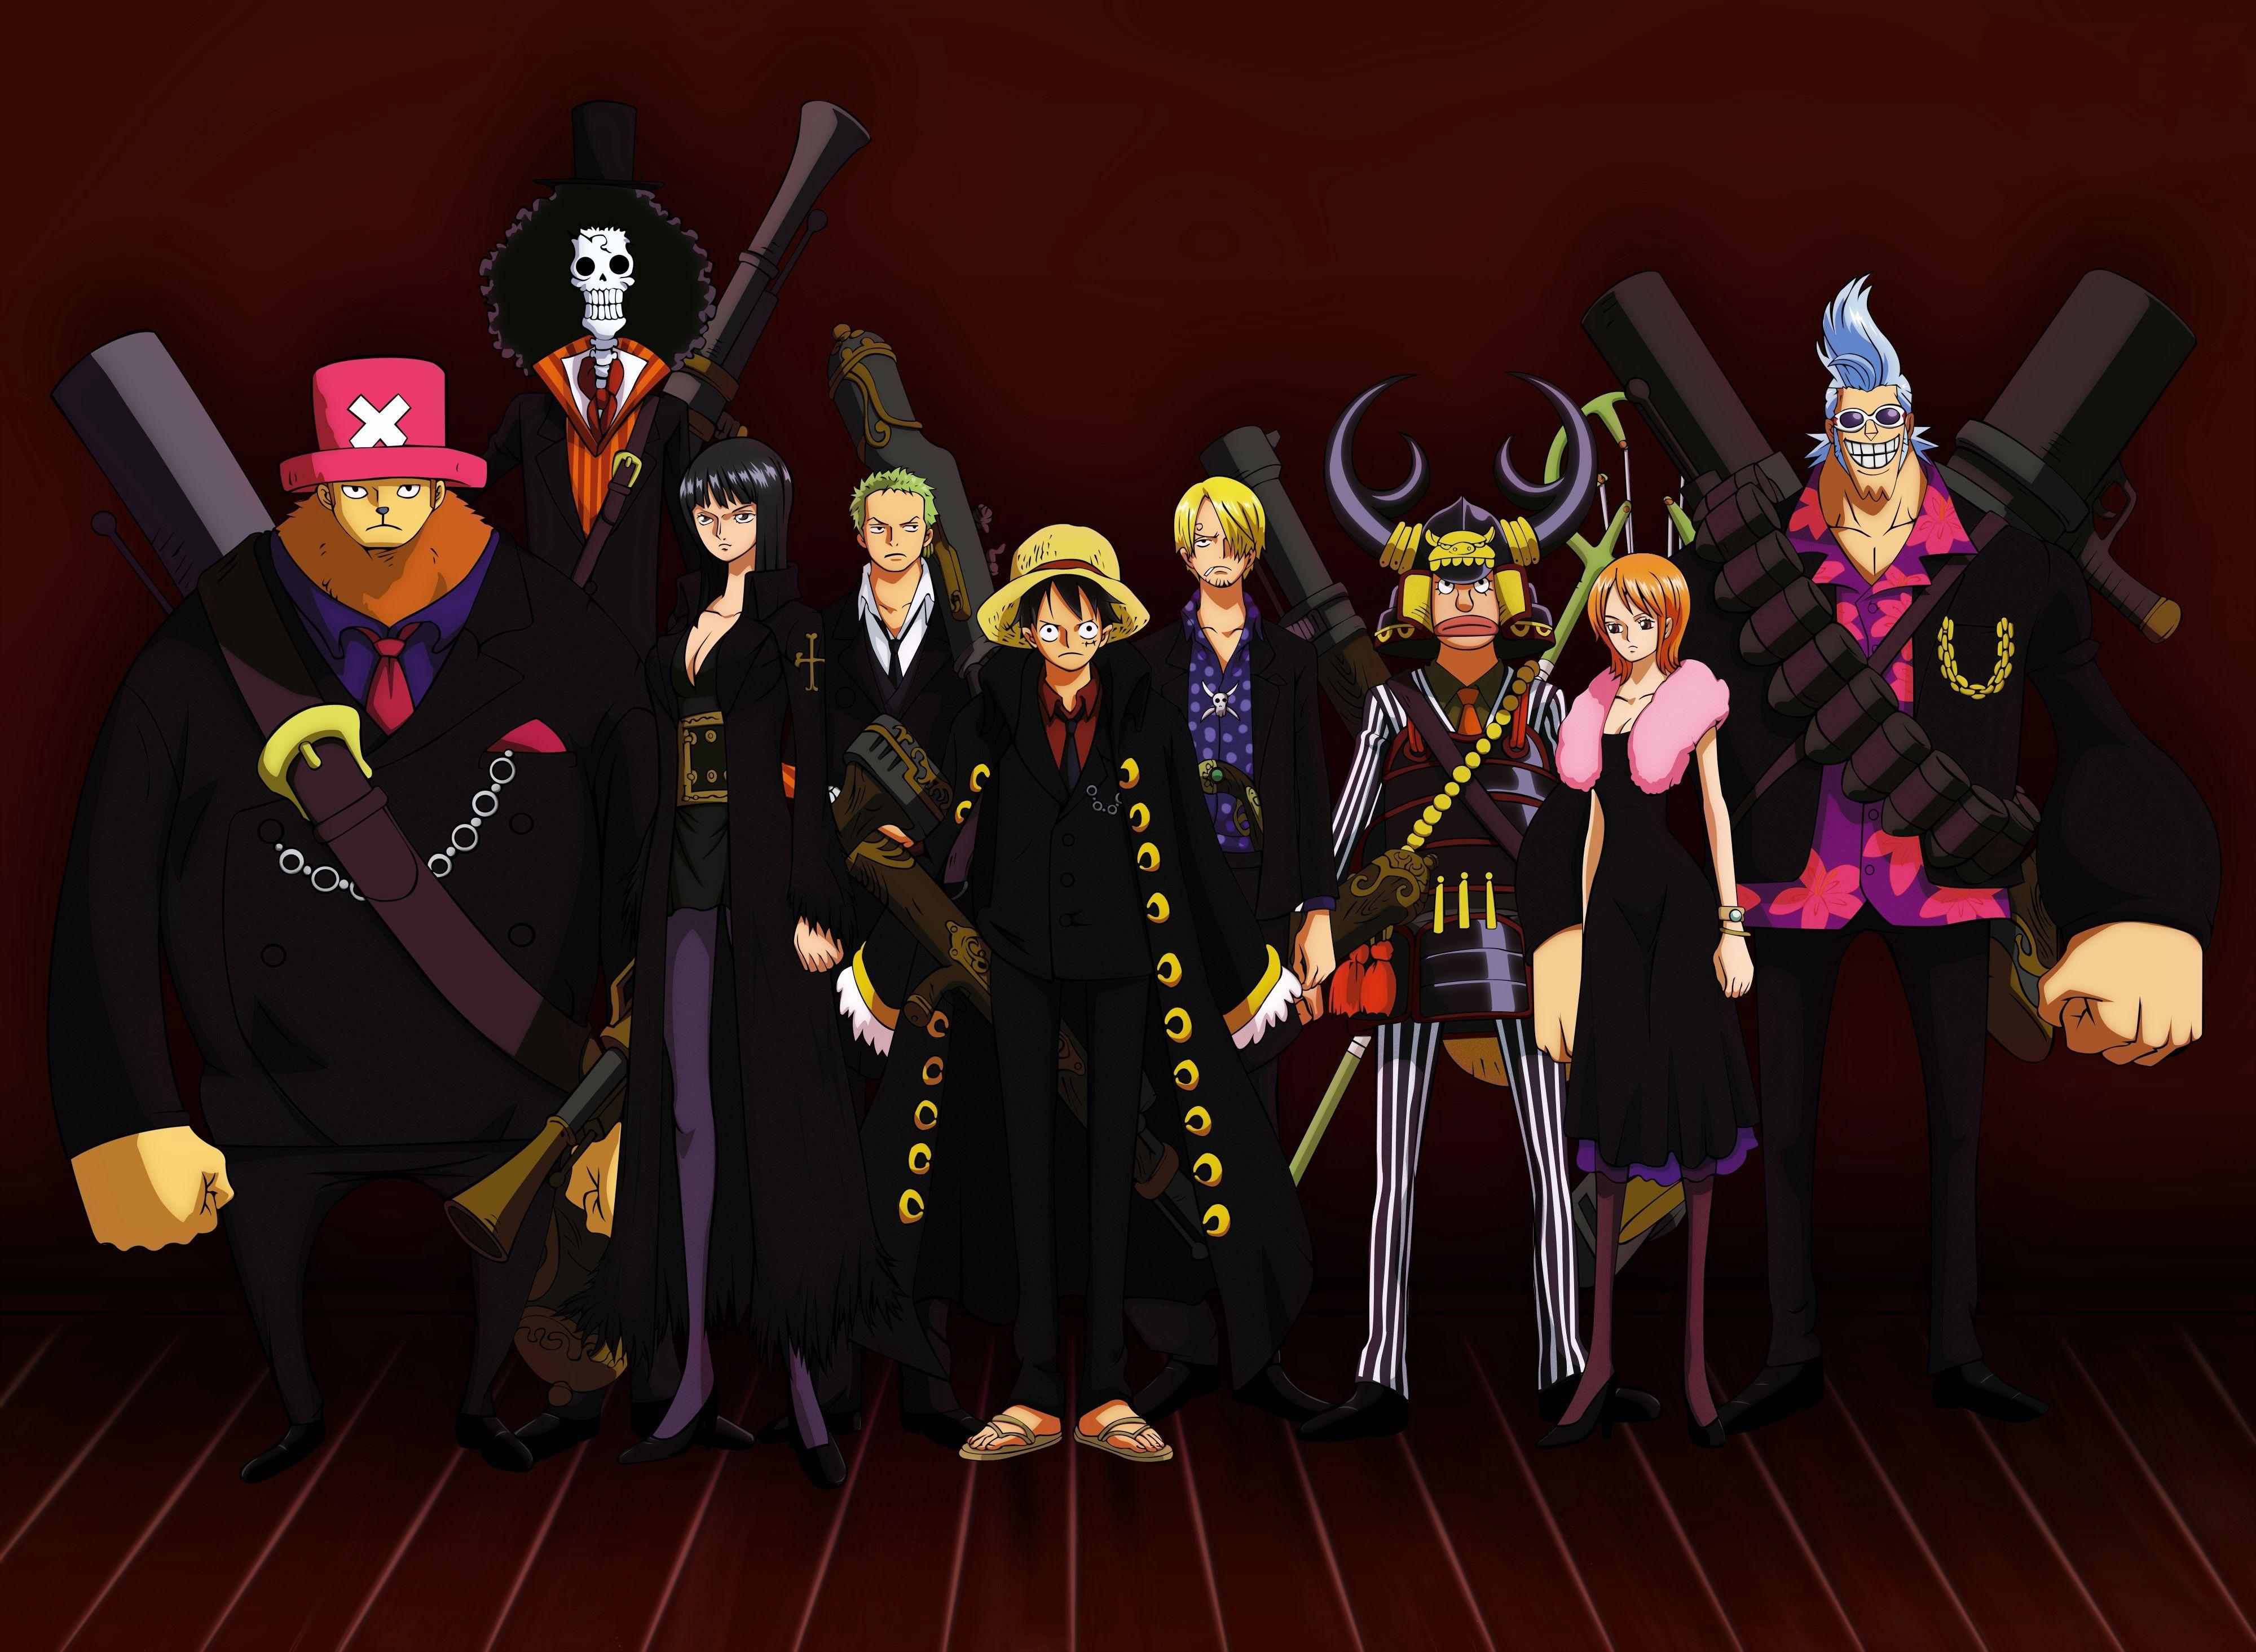 One Piece Strong World ダークなアニメ 海賊 イラスト